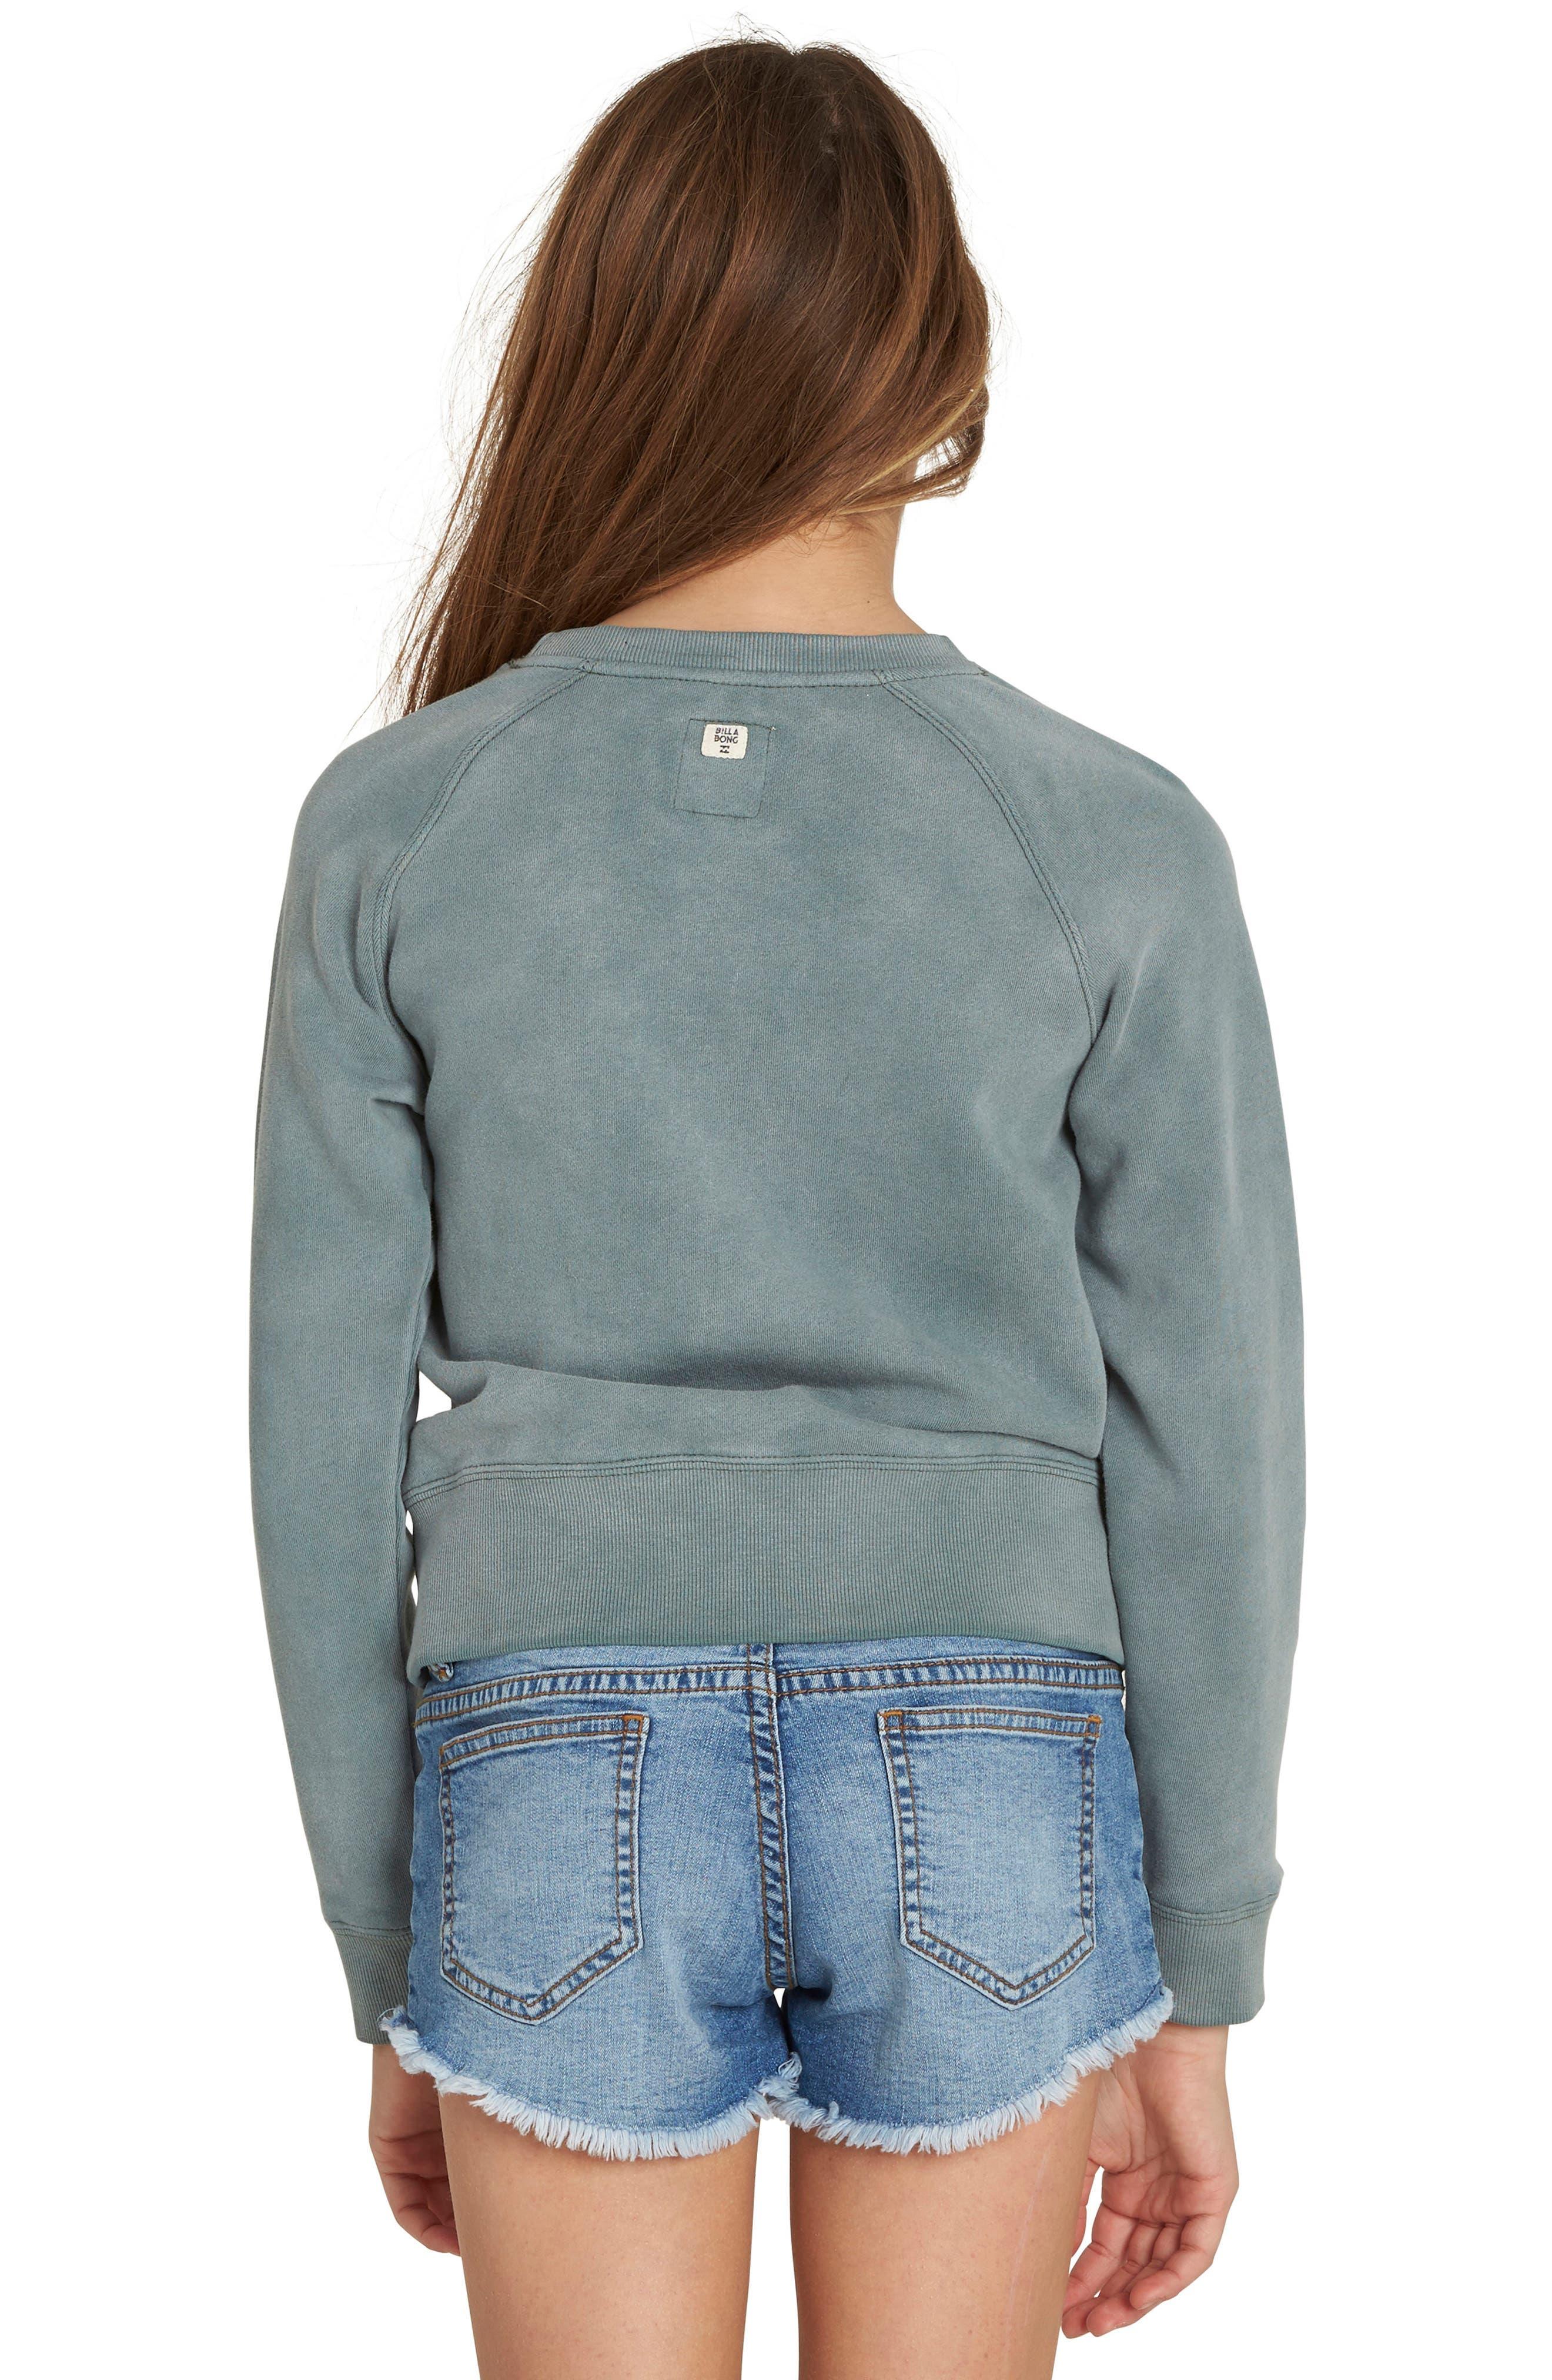 Whole Heart Graphic Sweatshirt,                             Alternate thumbnail 2, color,                             Sugar Pine